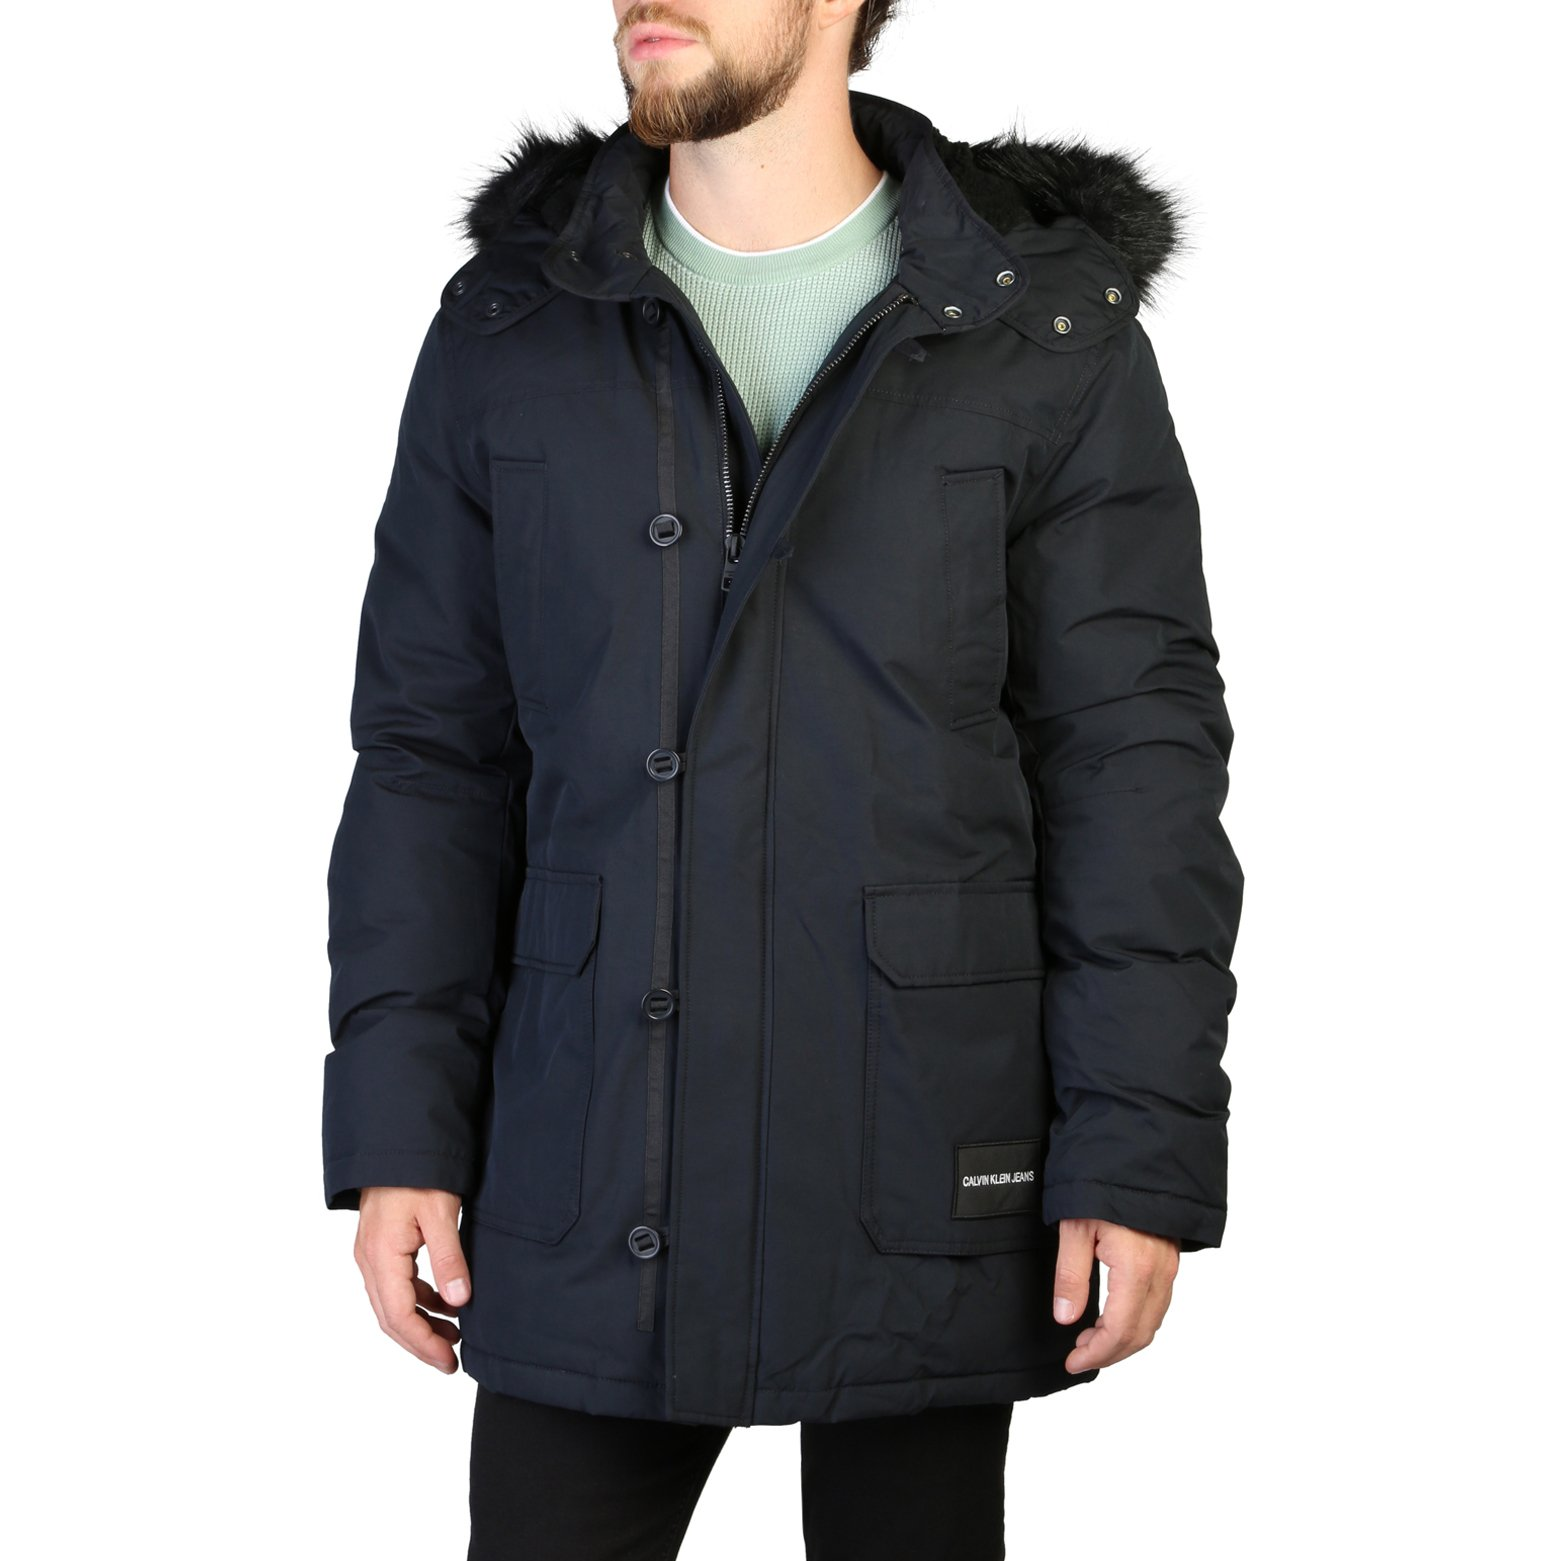 Calvin Klein Men's Jacket Green 349348 - black XL